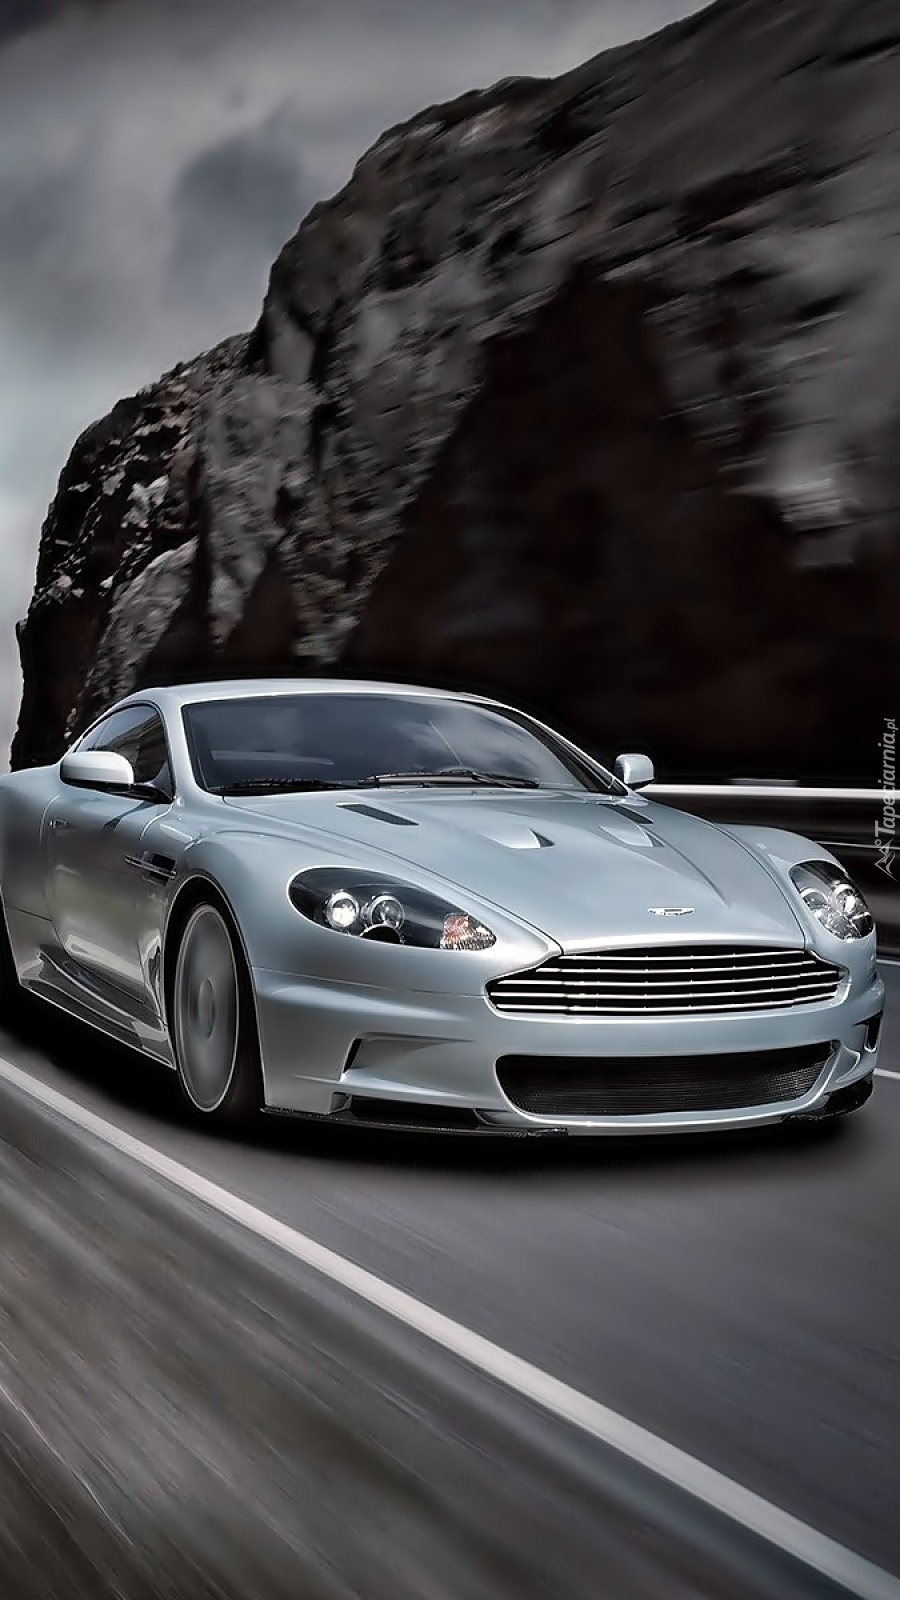 Aston Martin DBS na drodze